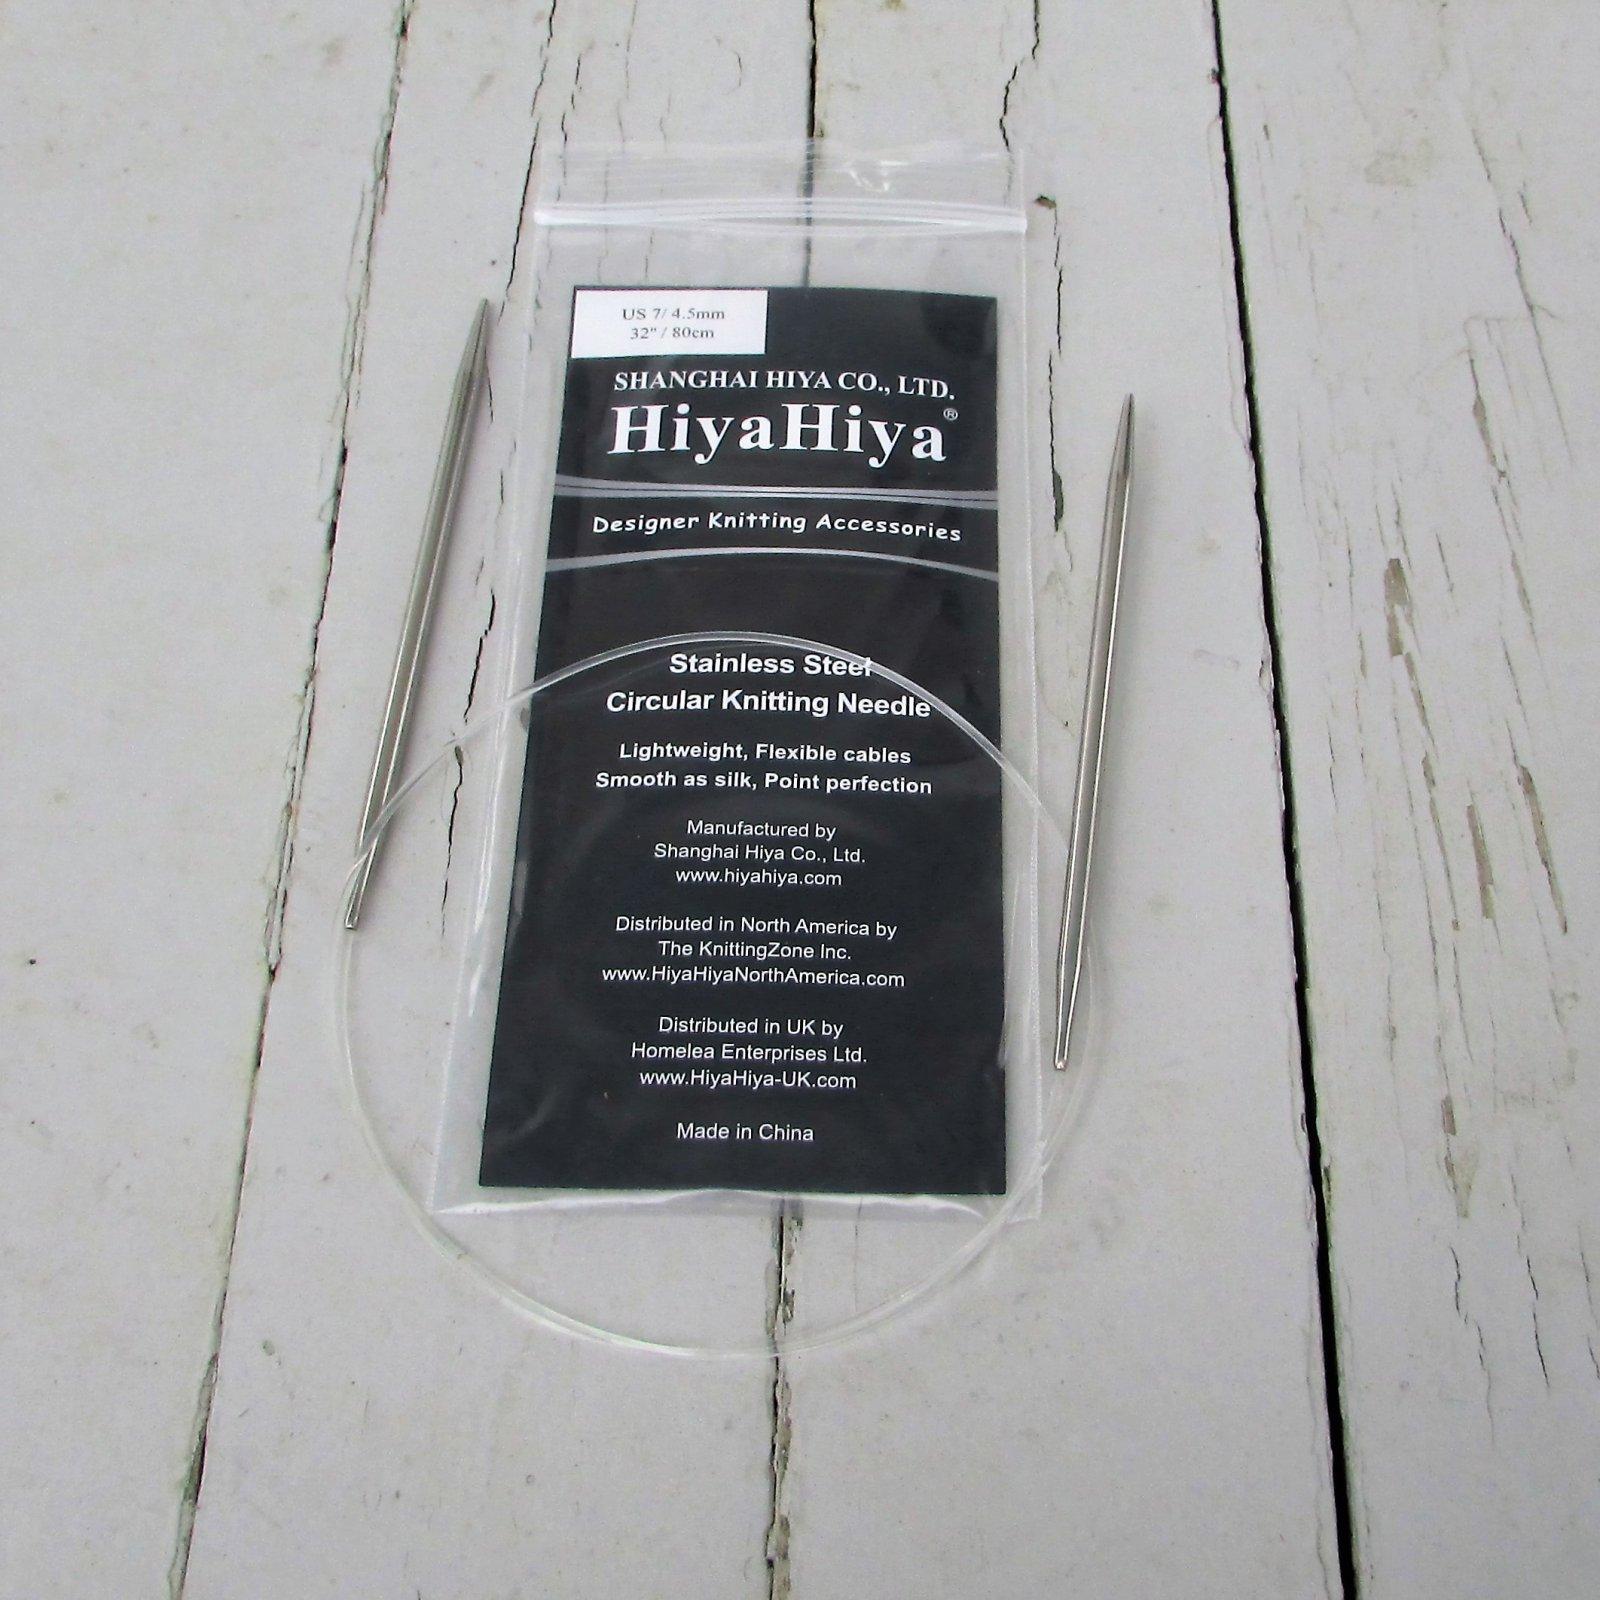 HiyaHiya Standard Stainless Steel 32 Circular Needle